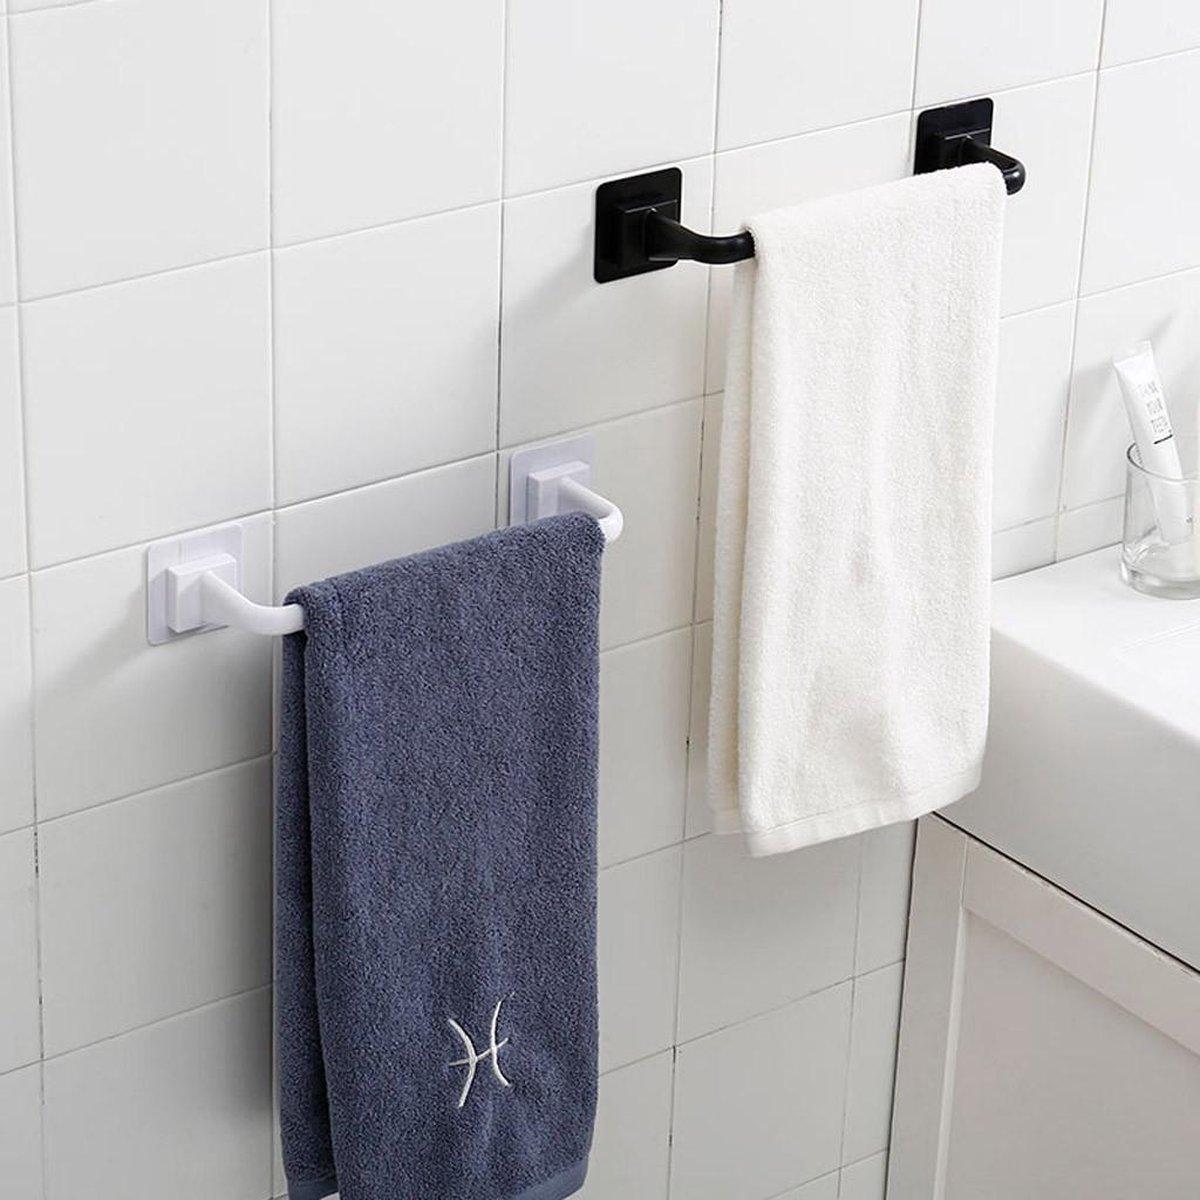 Handdoekrek Badkamer - Handdoekrek Keuken - Zelfklevend - Handdoekrek zwart - Sterk & Waterproof - Handdoekhouder - 40.5CM